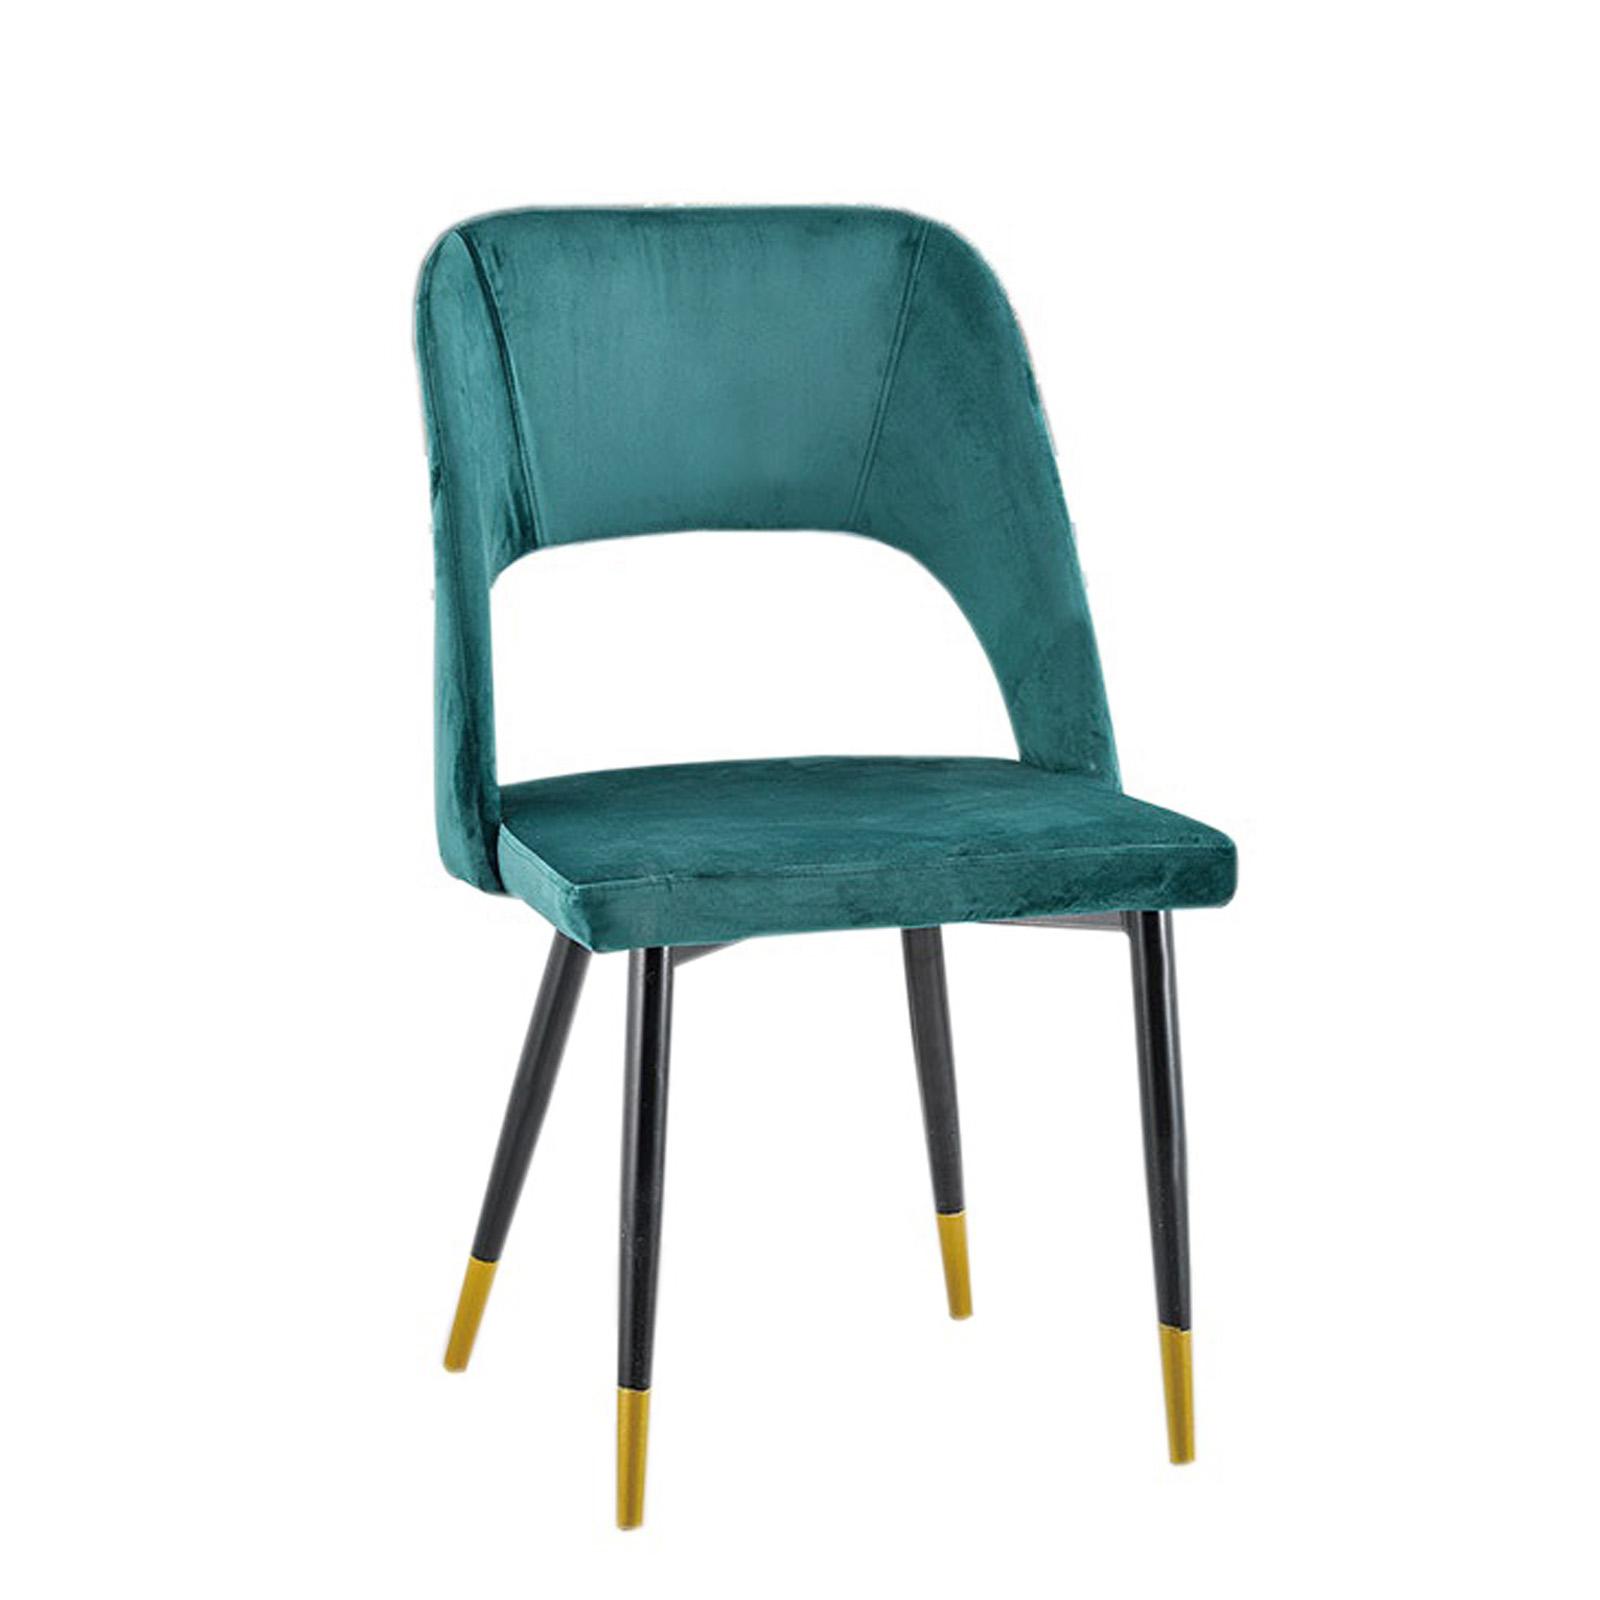 Sedie imbottite velluto gambe in metallo nero e oro 50 x 60 cm